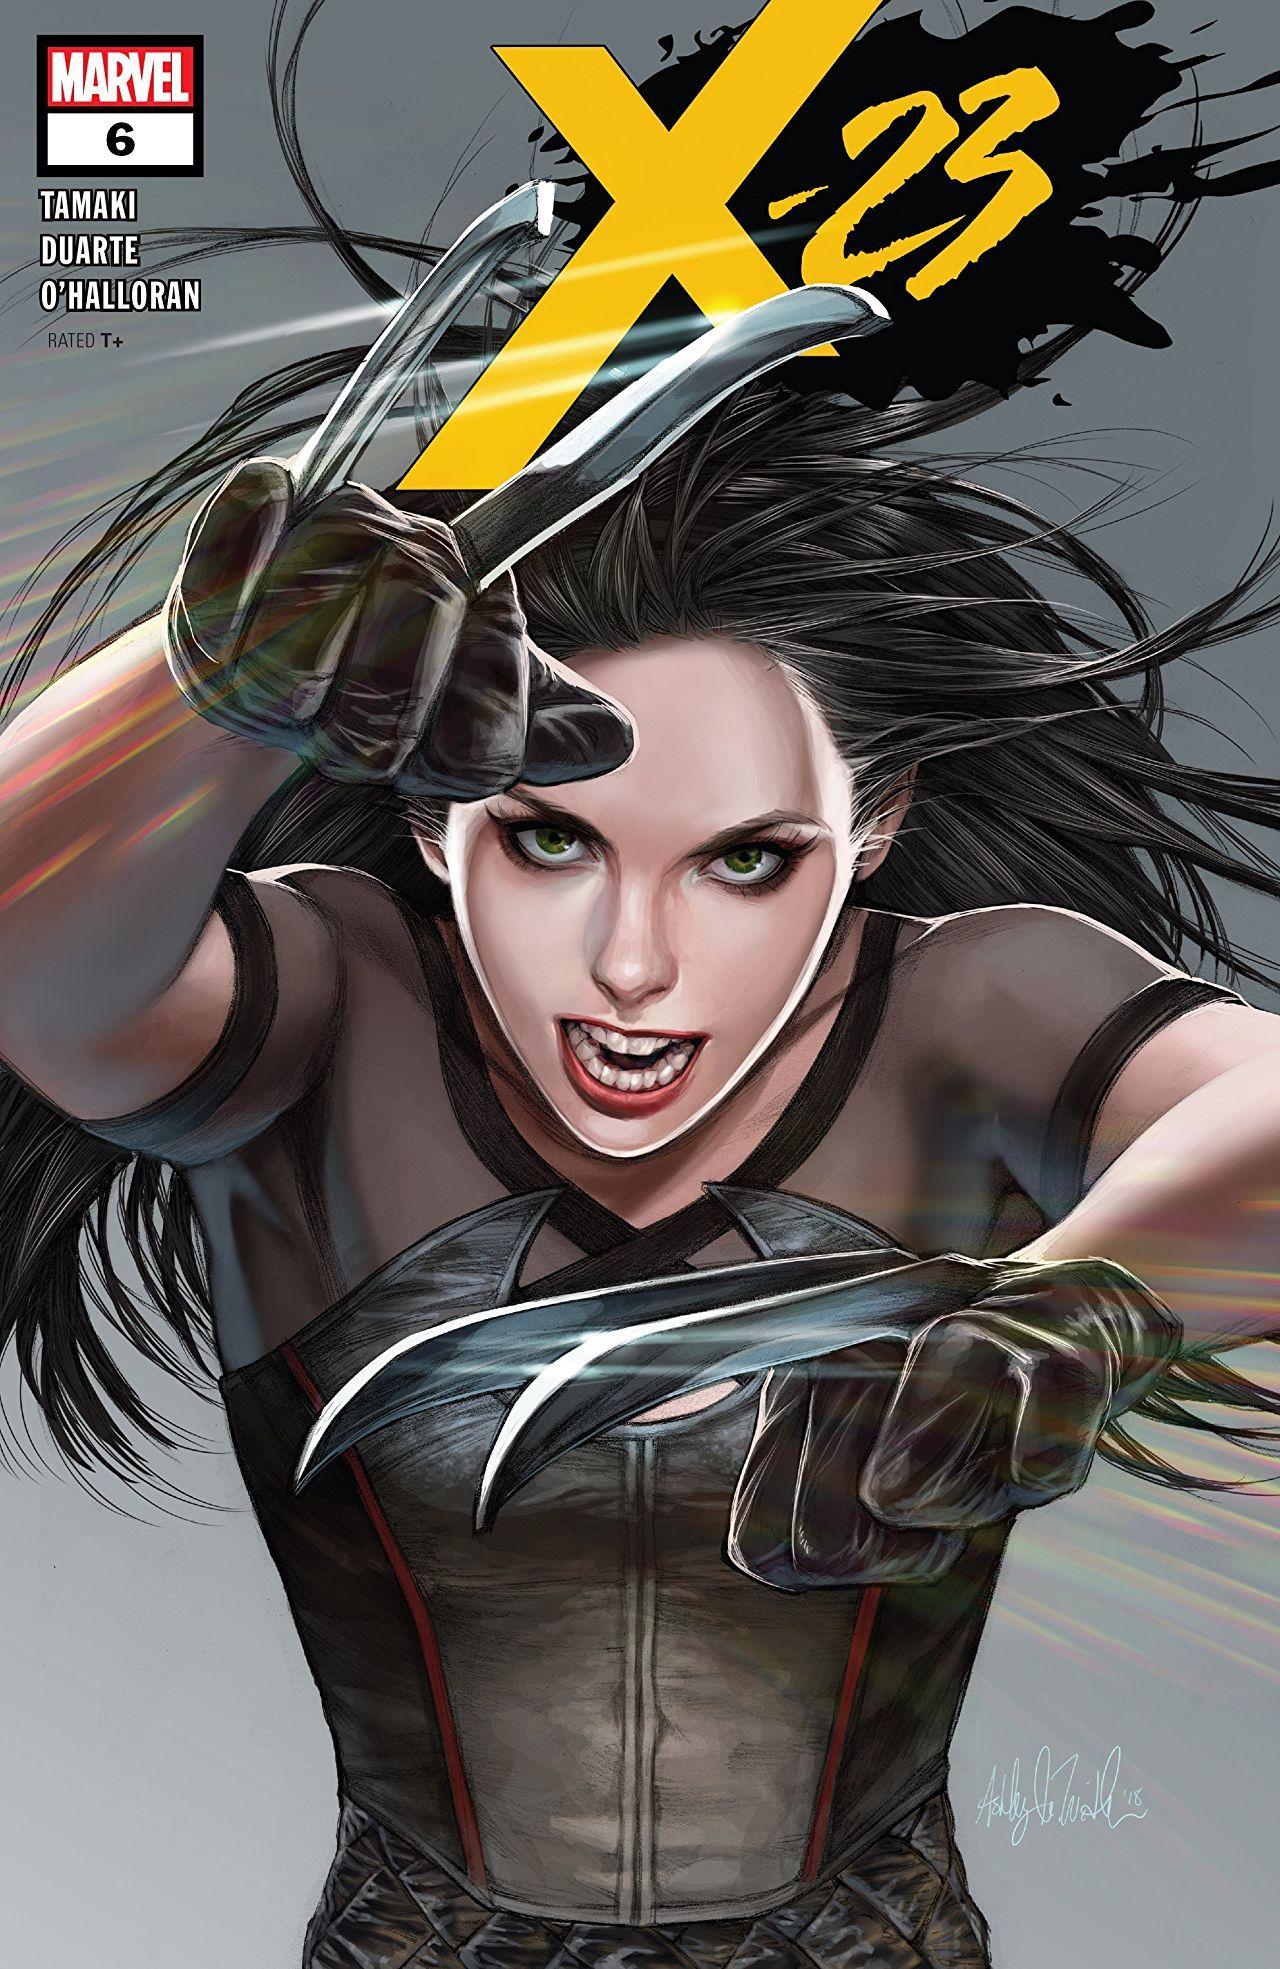 wolverine - Marvel Comics X-23 #1 2018